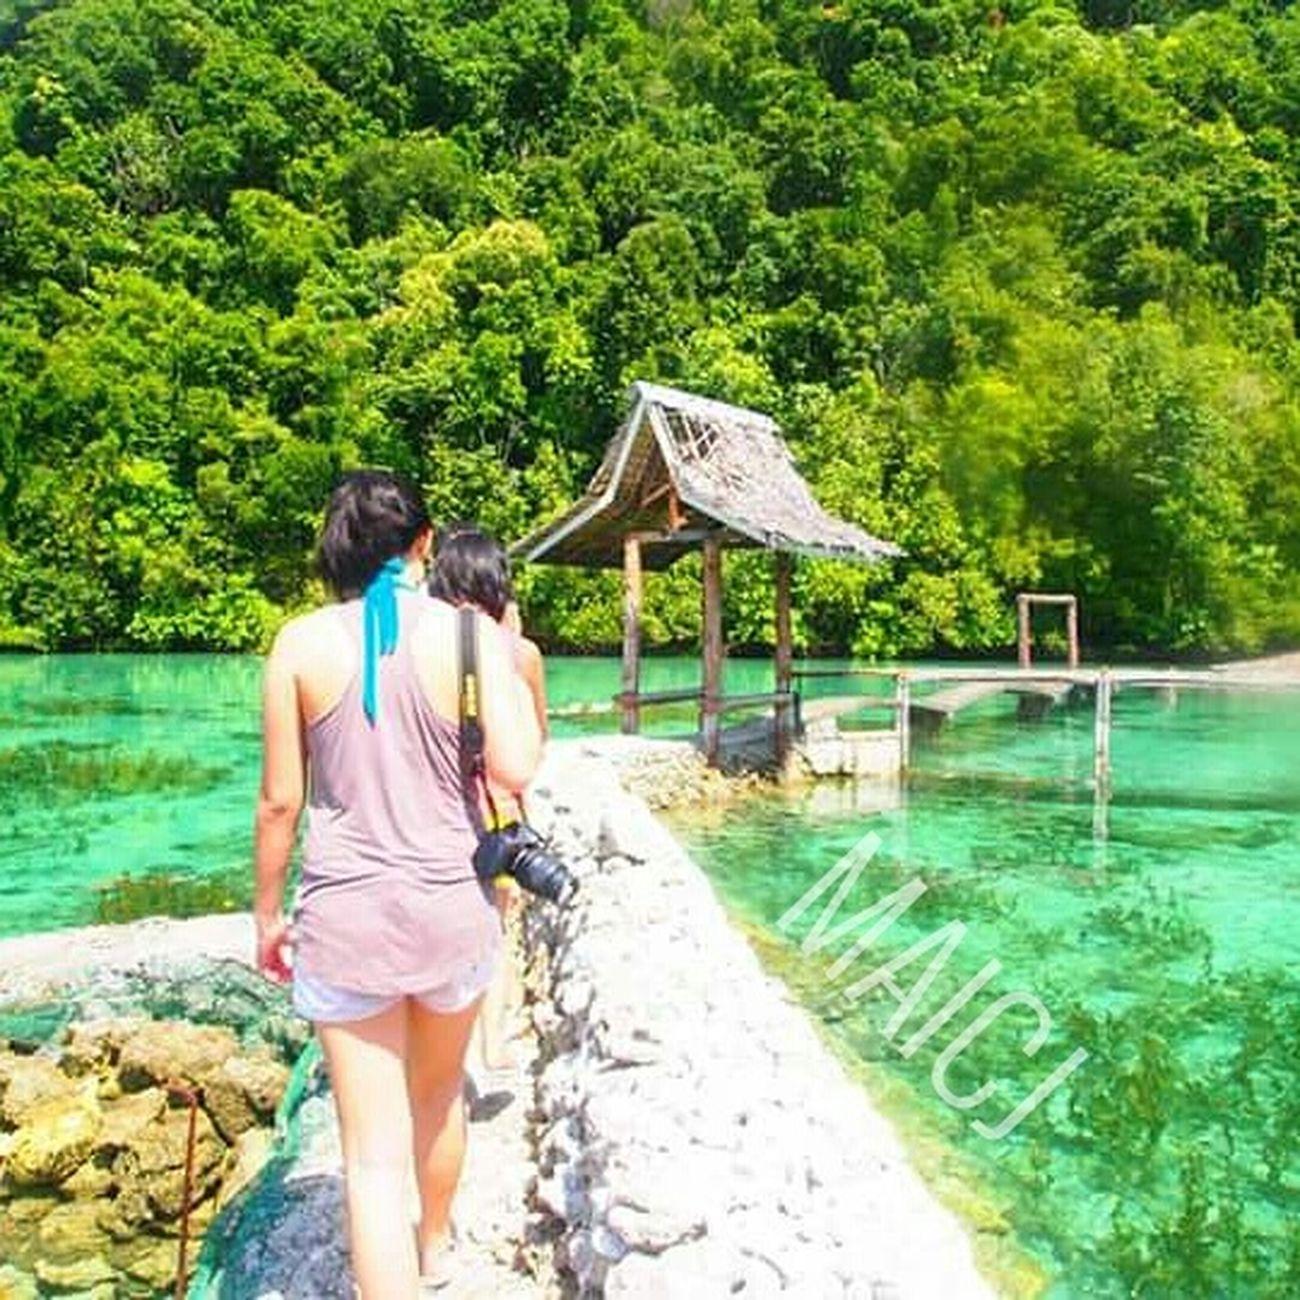 surigao ,philippines Enjoying Life OldMemories Nostagia Travel Photography Travelgram Beautiful Nature Beauty Nature Photography